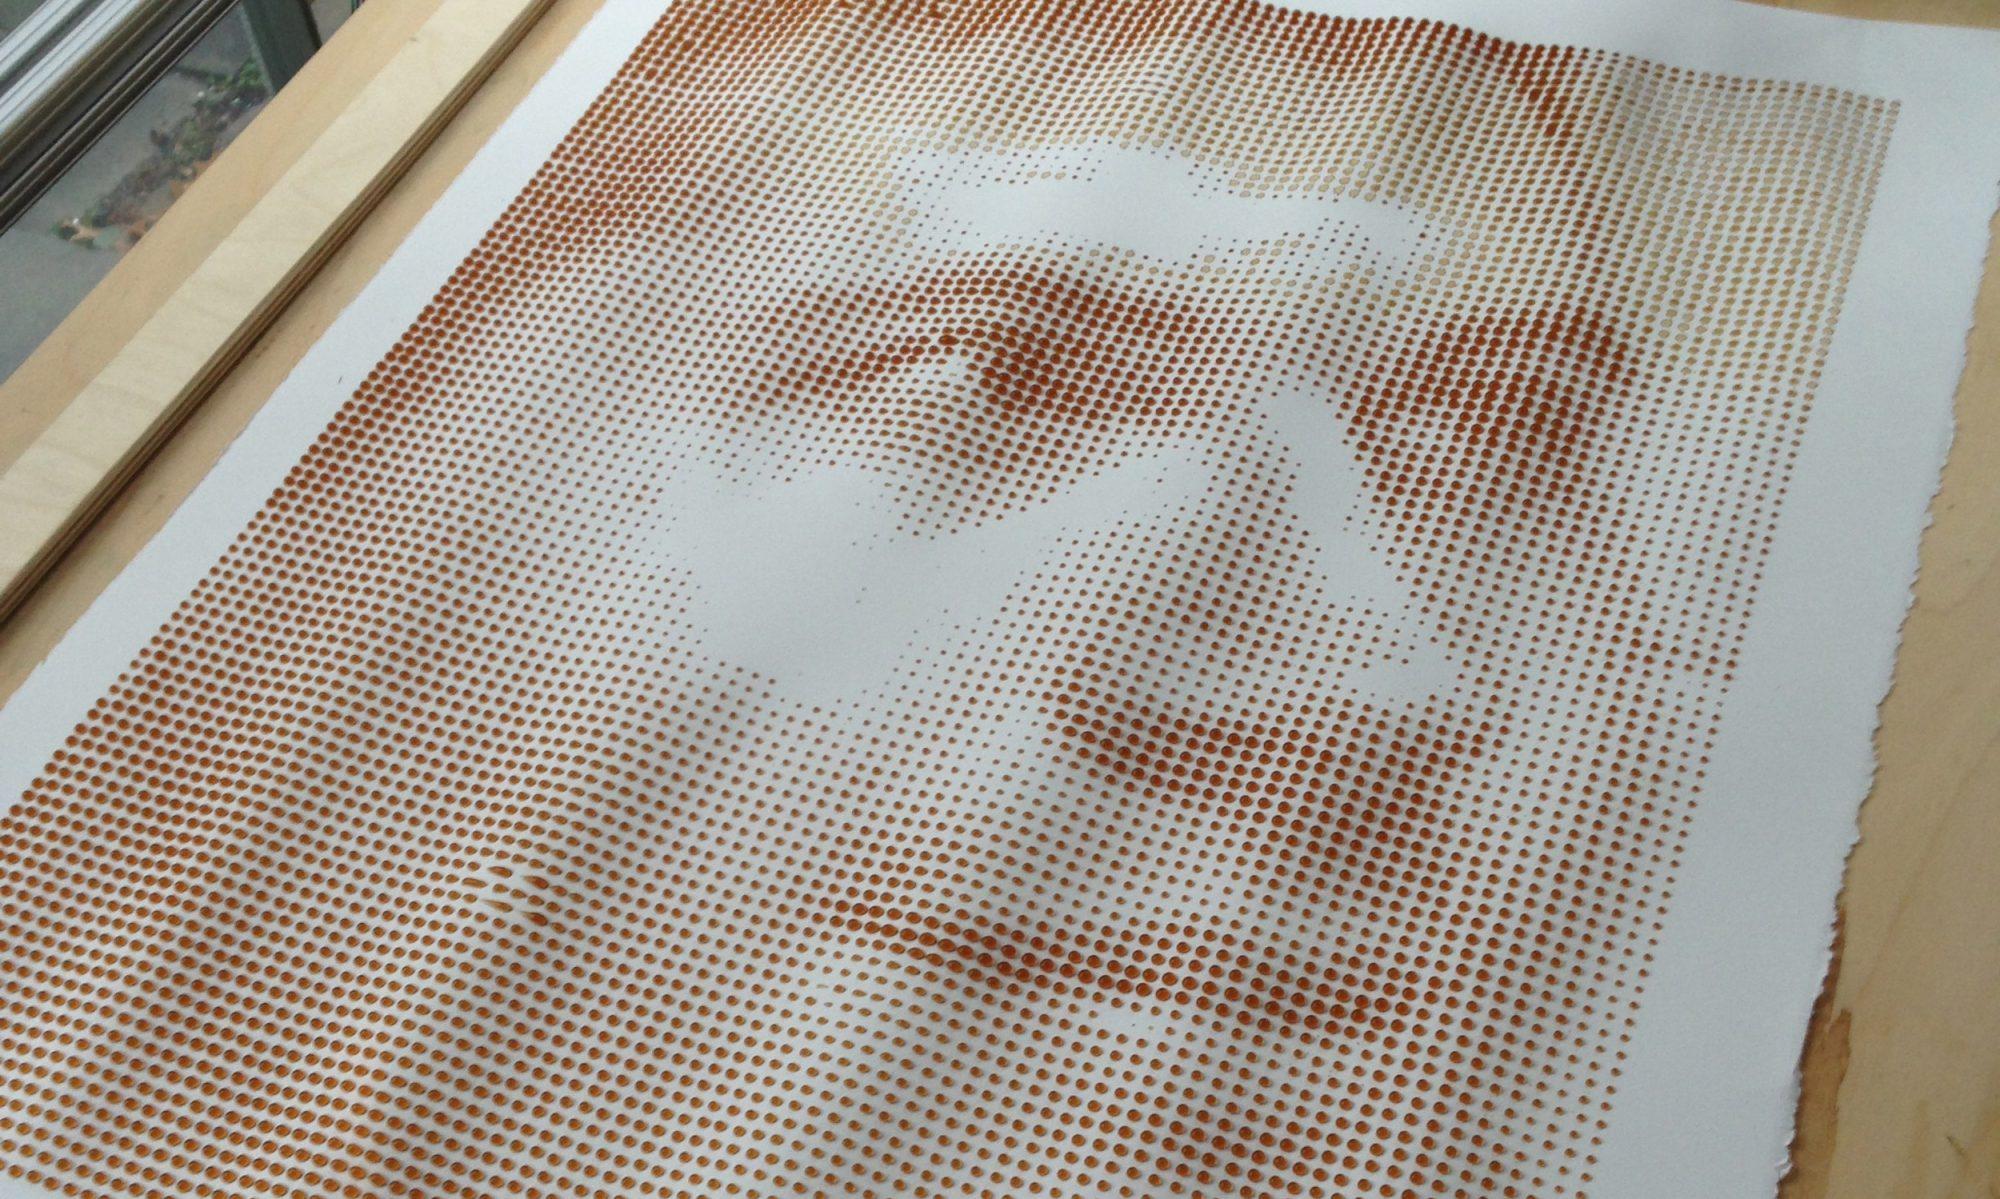 EC: This Coffee Drip Printer Makes Caffeinated Works of Art